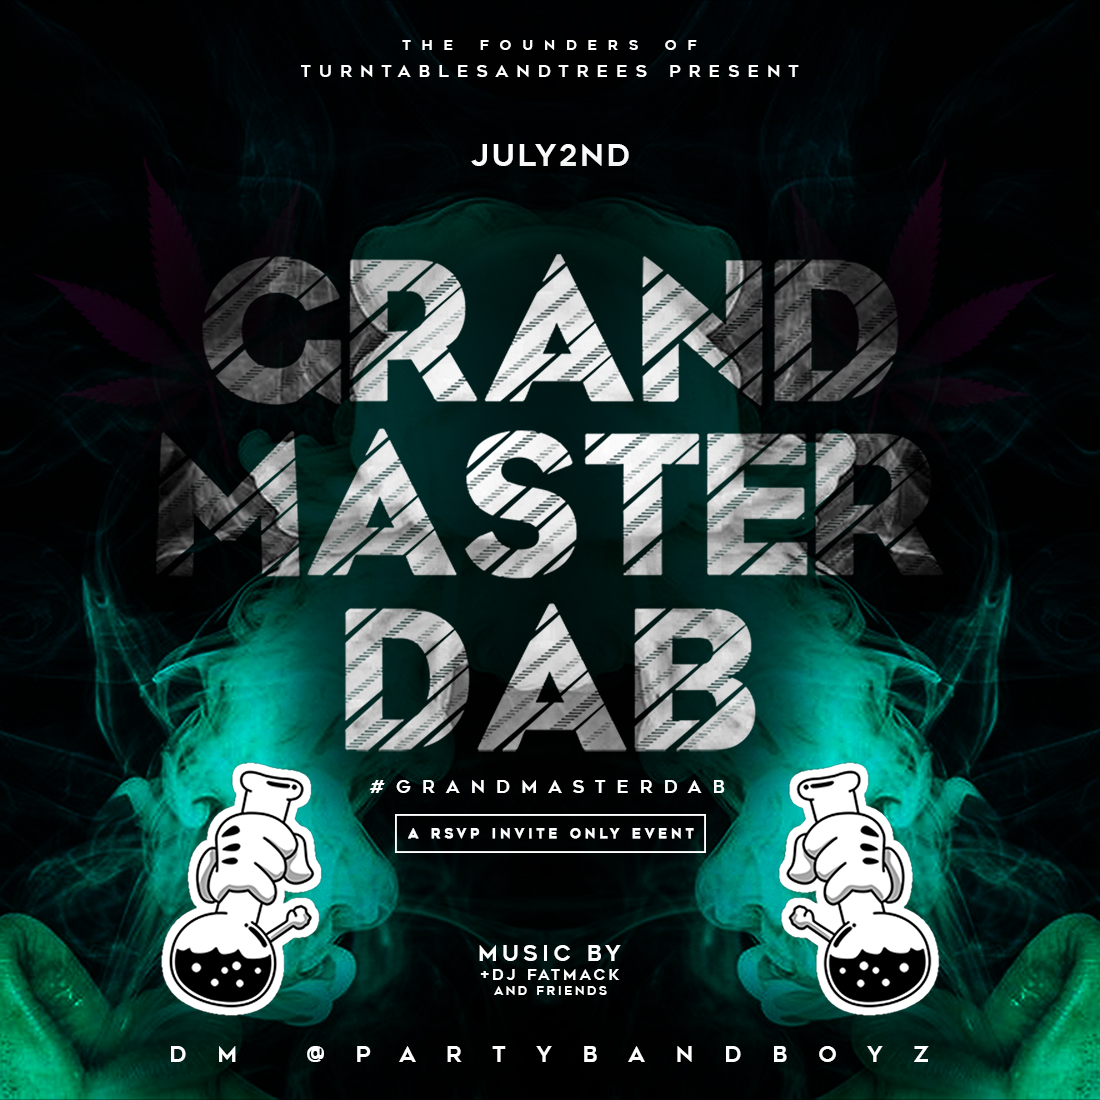 Grand Master Dab